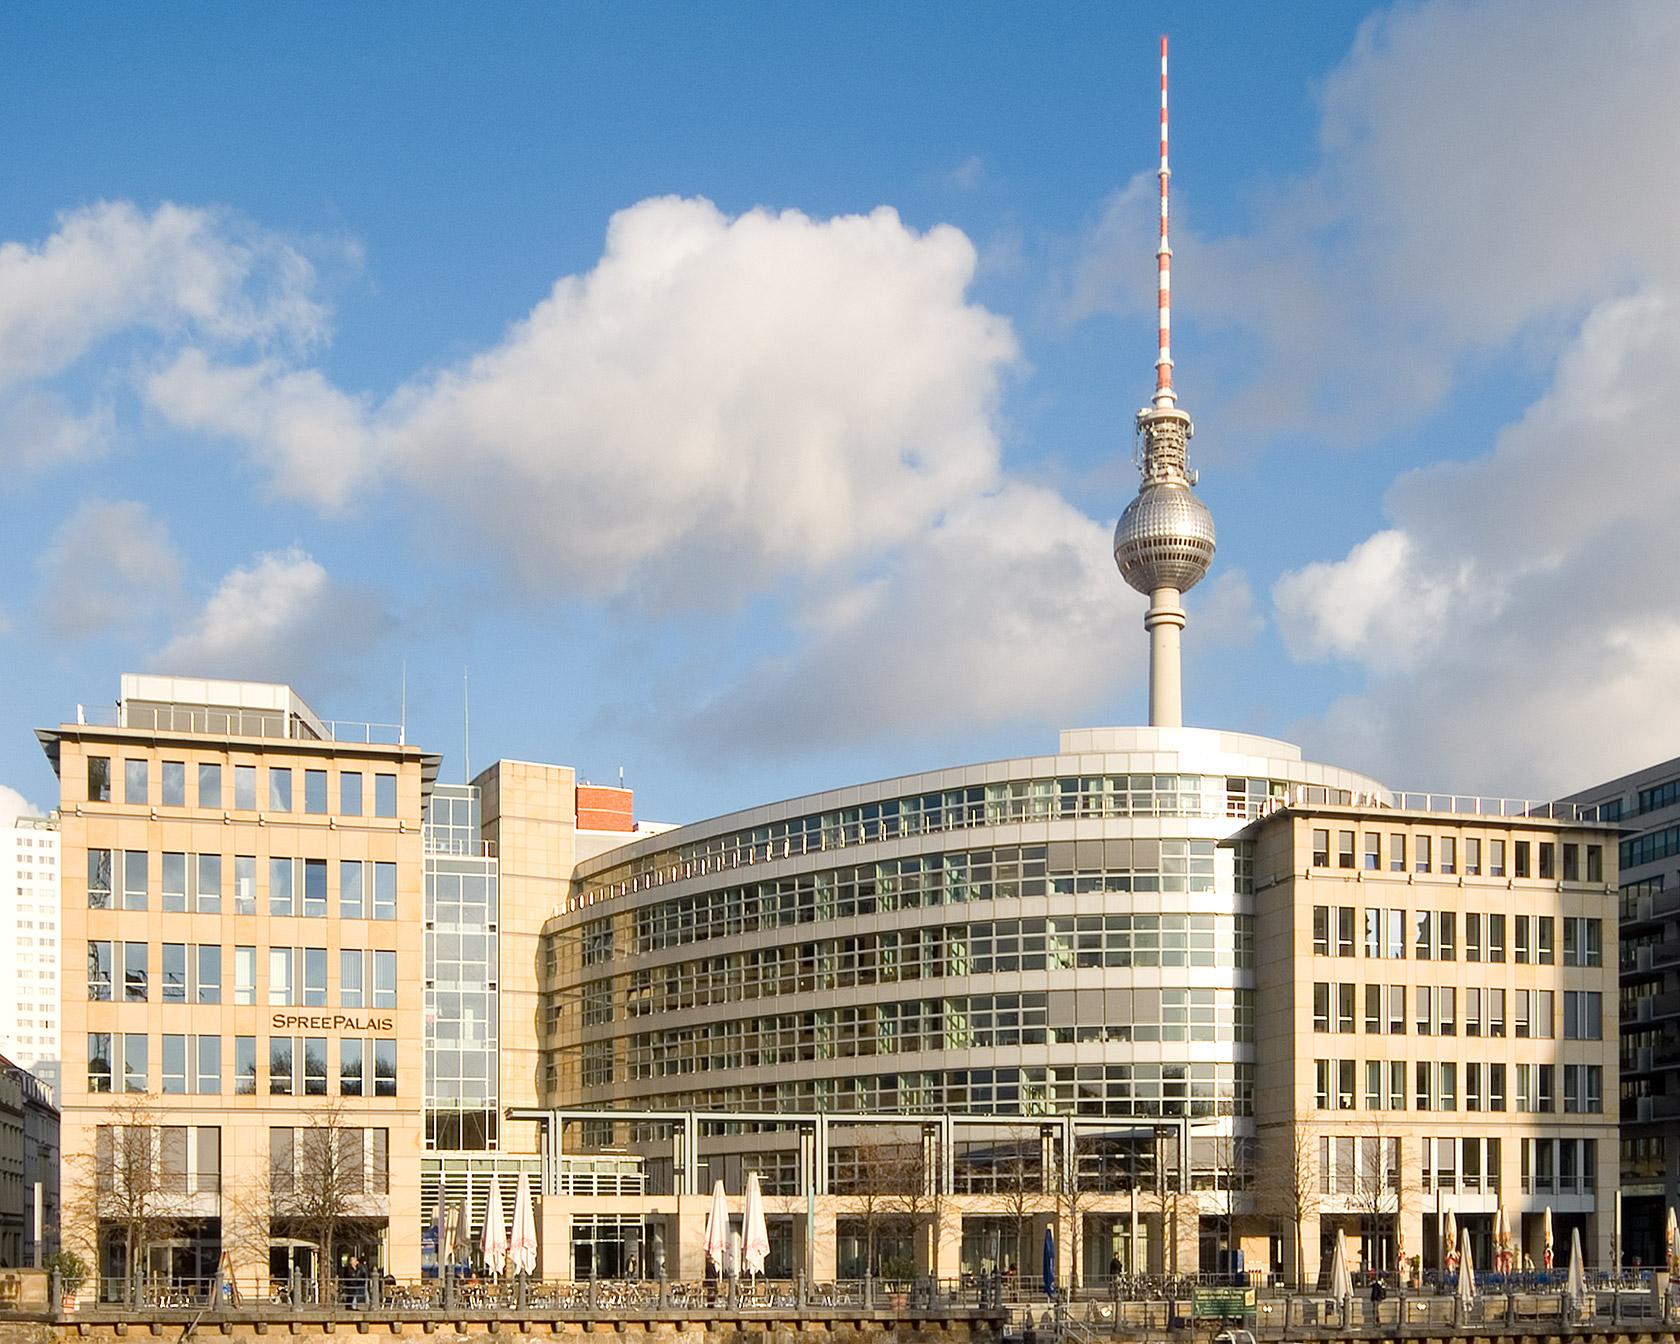 Fraunhofer Forum im Spreepalais, Berlin